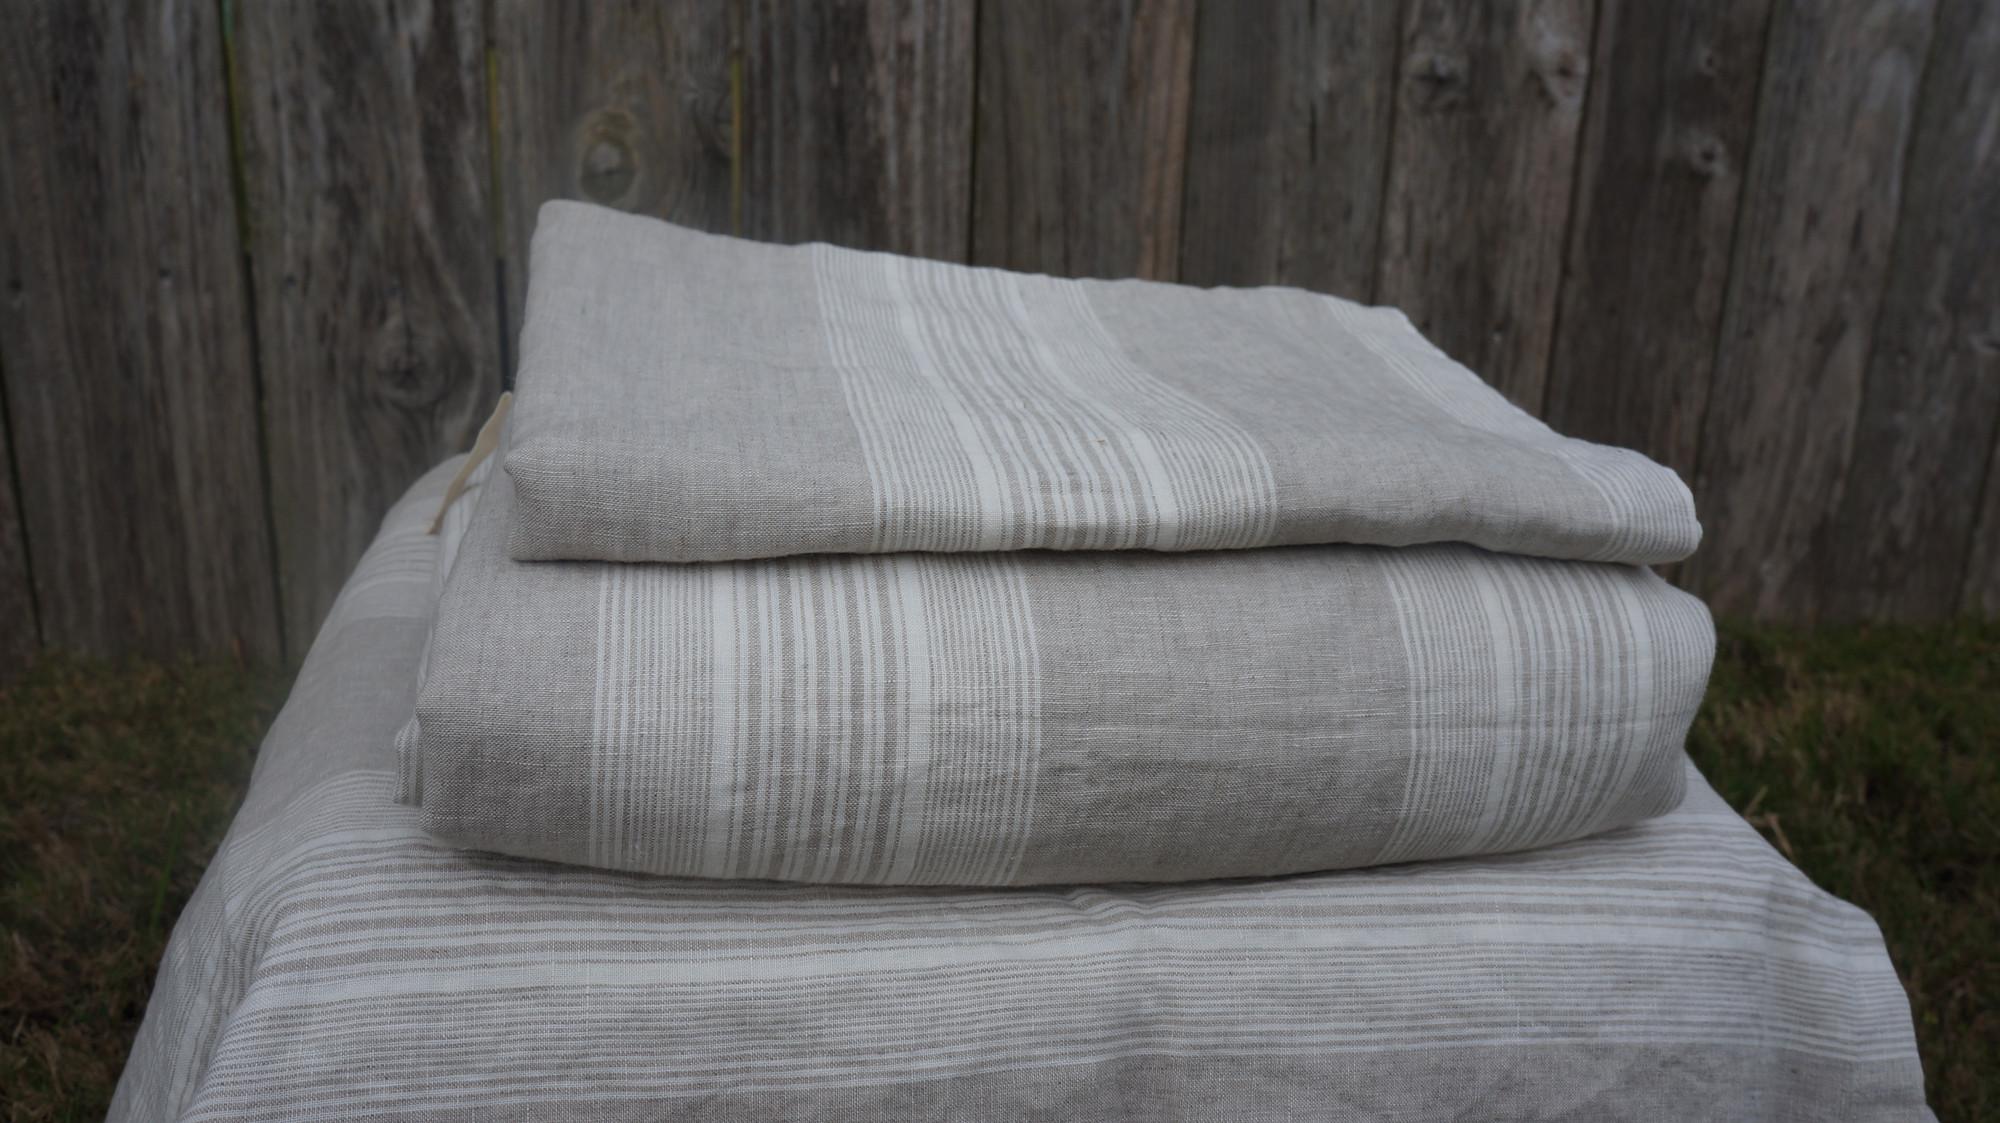 striped duvet cover handmade in natural linen superior custom linens. Black Bedroom Furniture Sets. Home Design Ideas